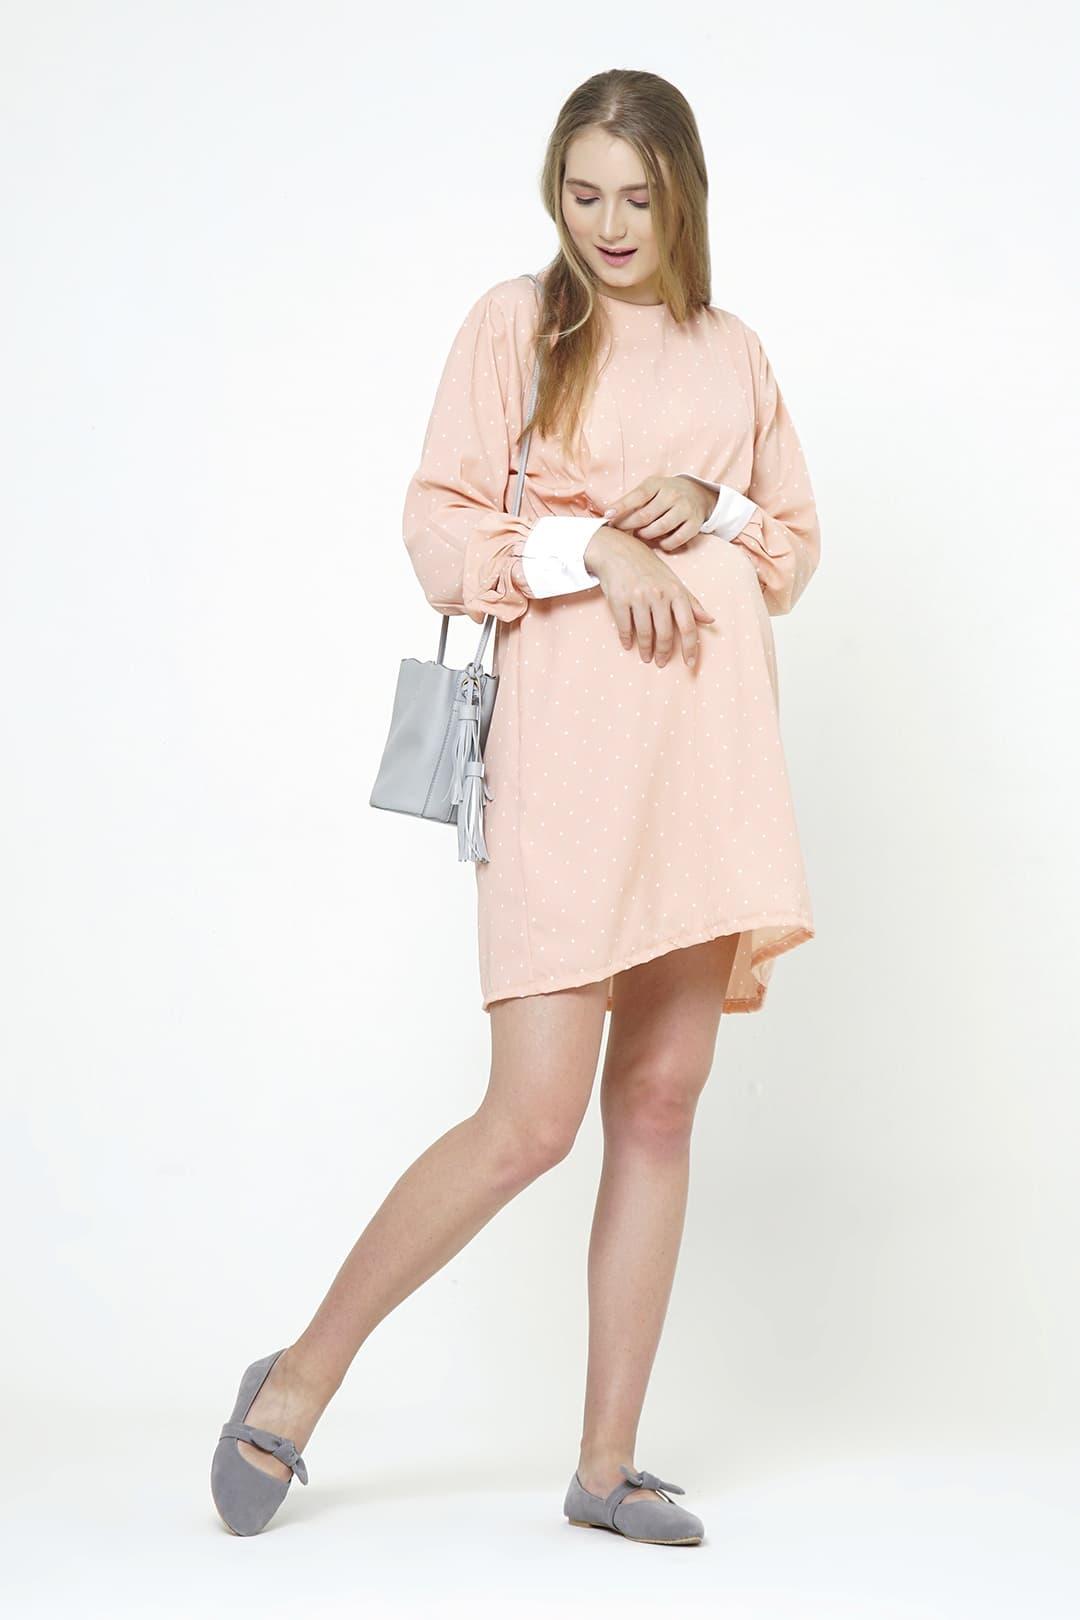 desain baju hamil kekinian klopdesain